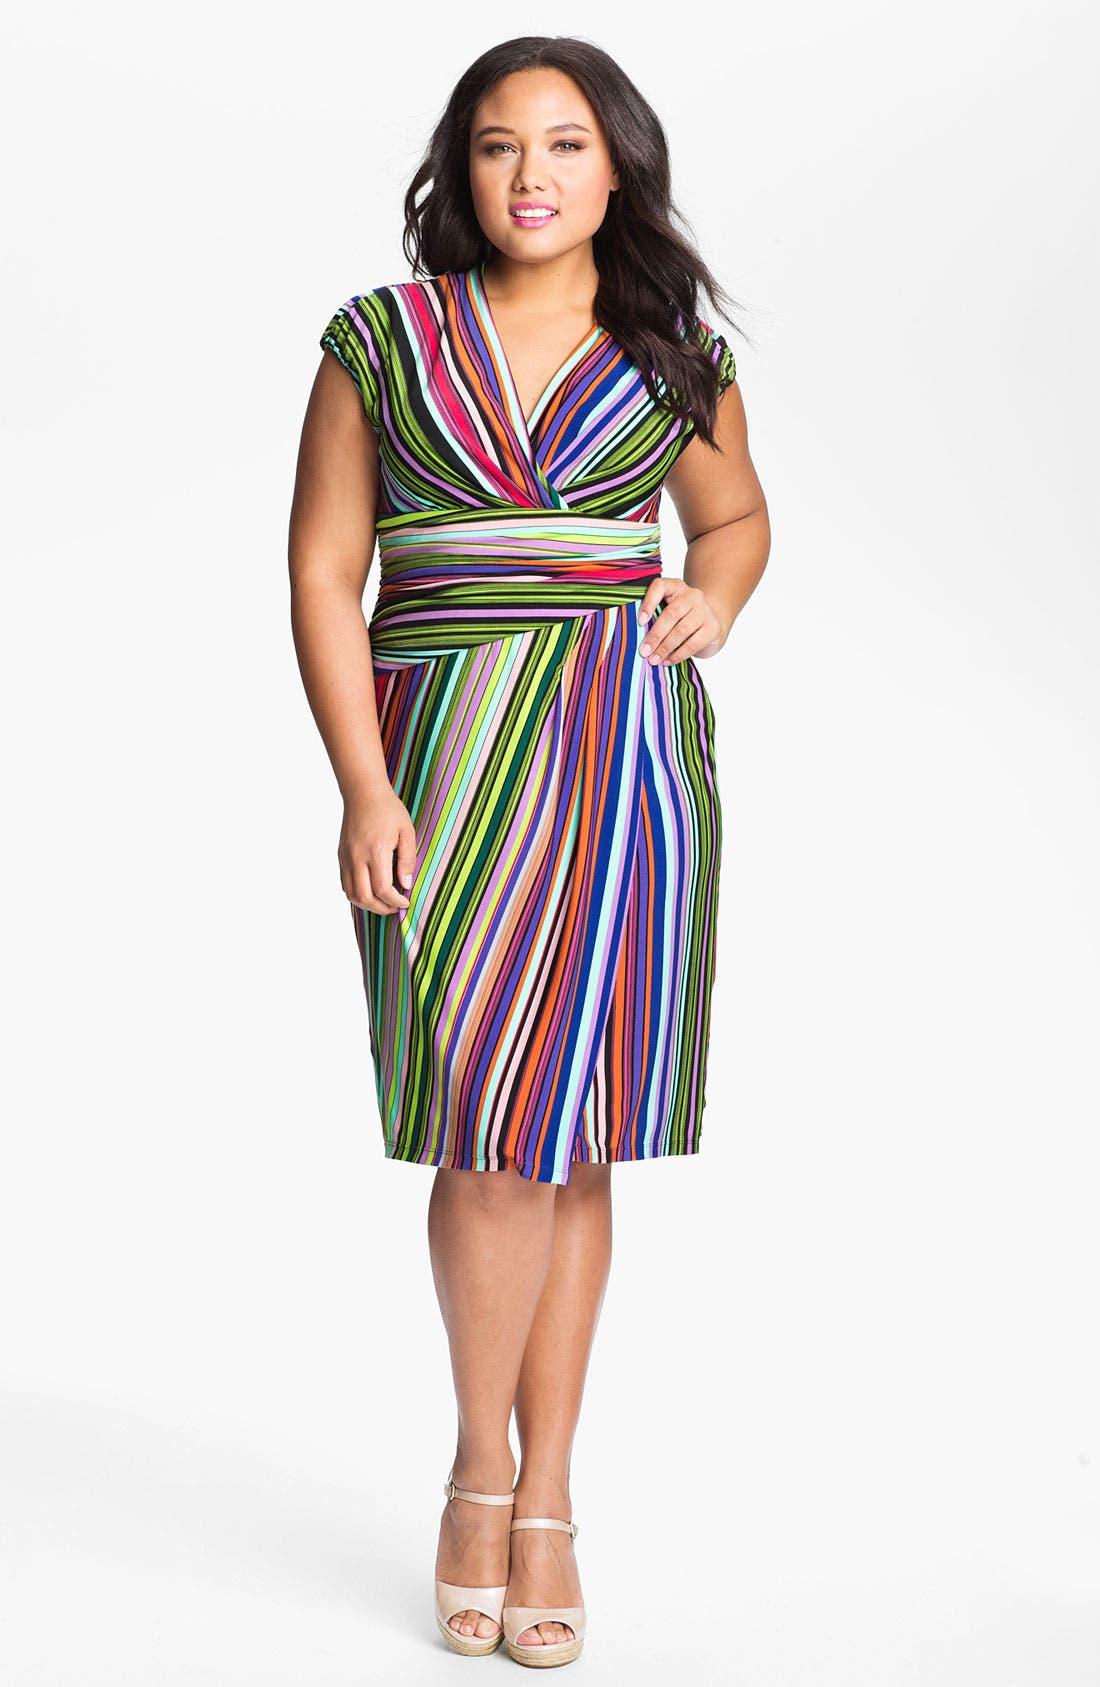 Main Image - Suzi Chin for Maggy Boutique Stripe Jersey Faux Wrap Dress (Plus Size)